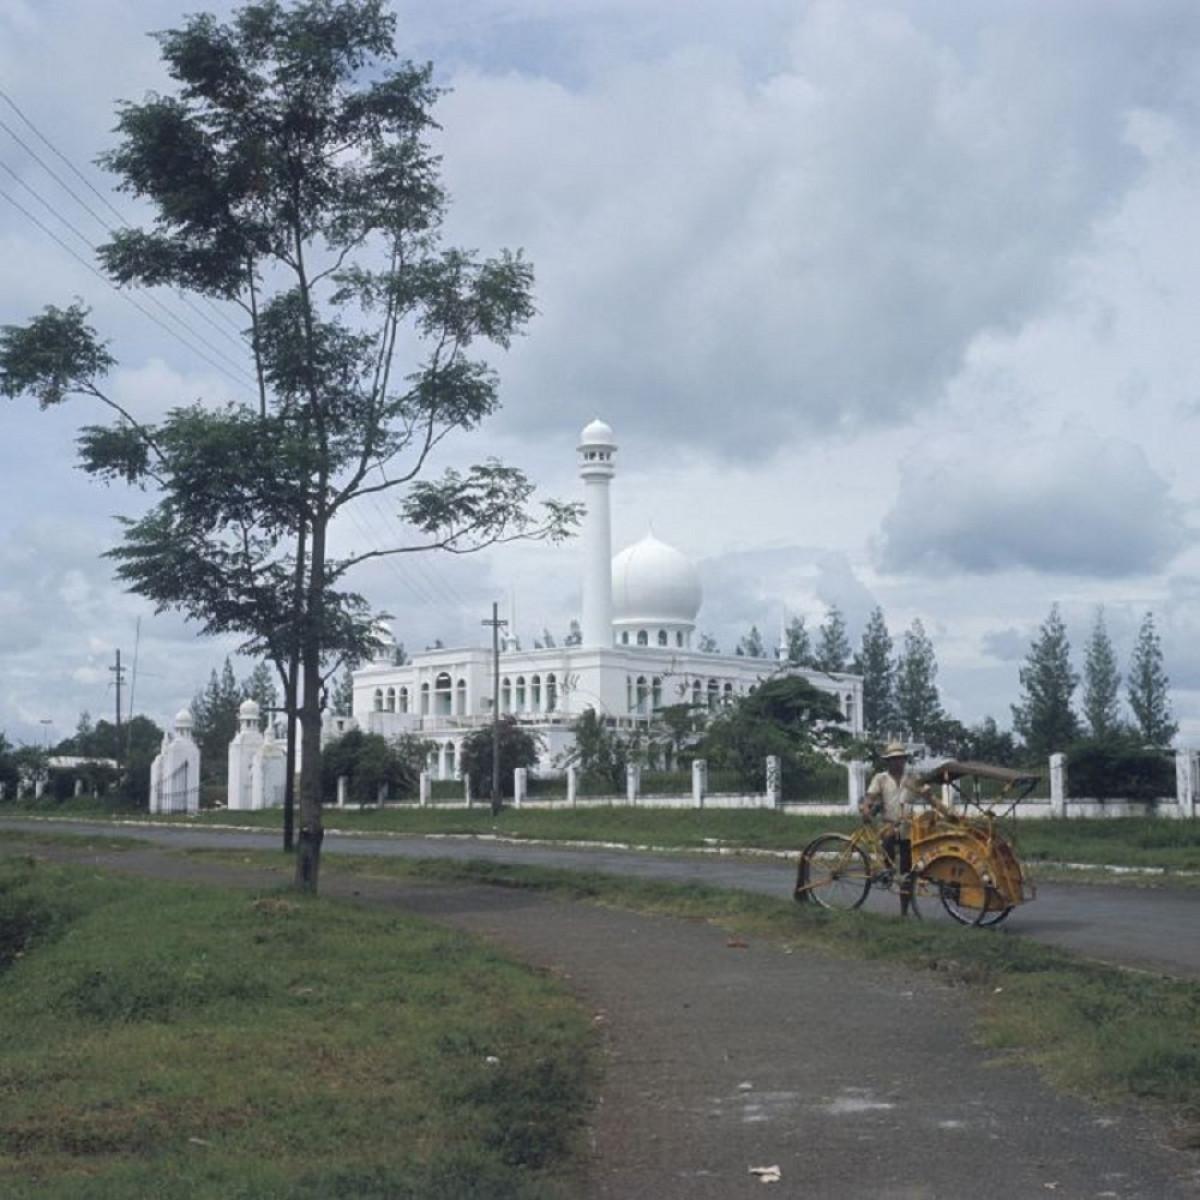 Sejarah Hari Ini (19 November 1953) - Masjid Al-Azhar, Terbesar Pertama Sebelum Istiqlal